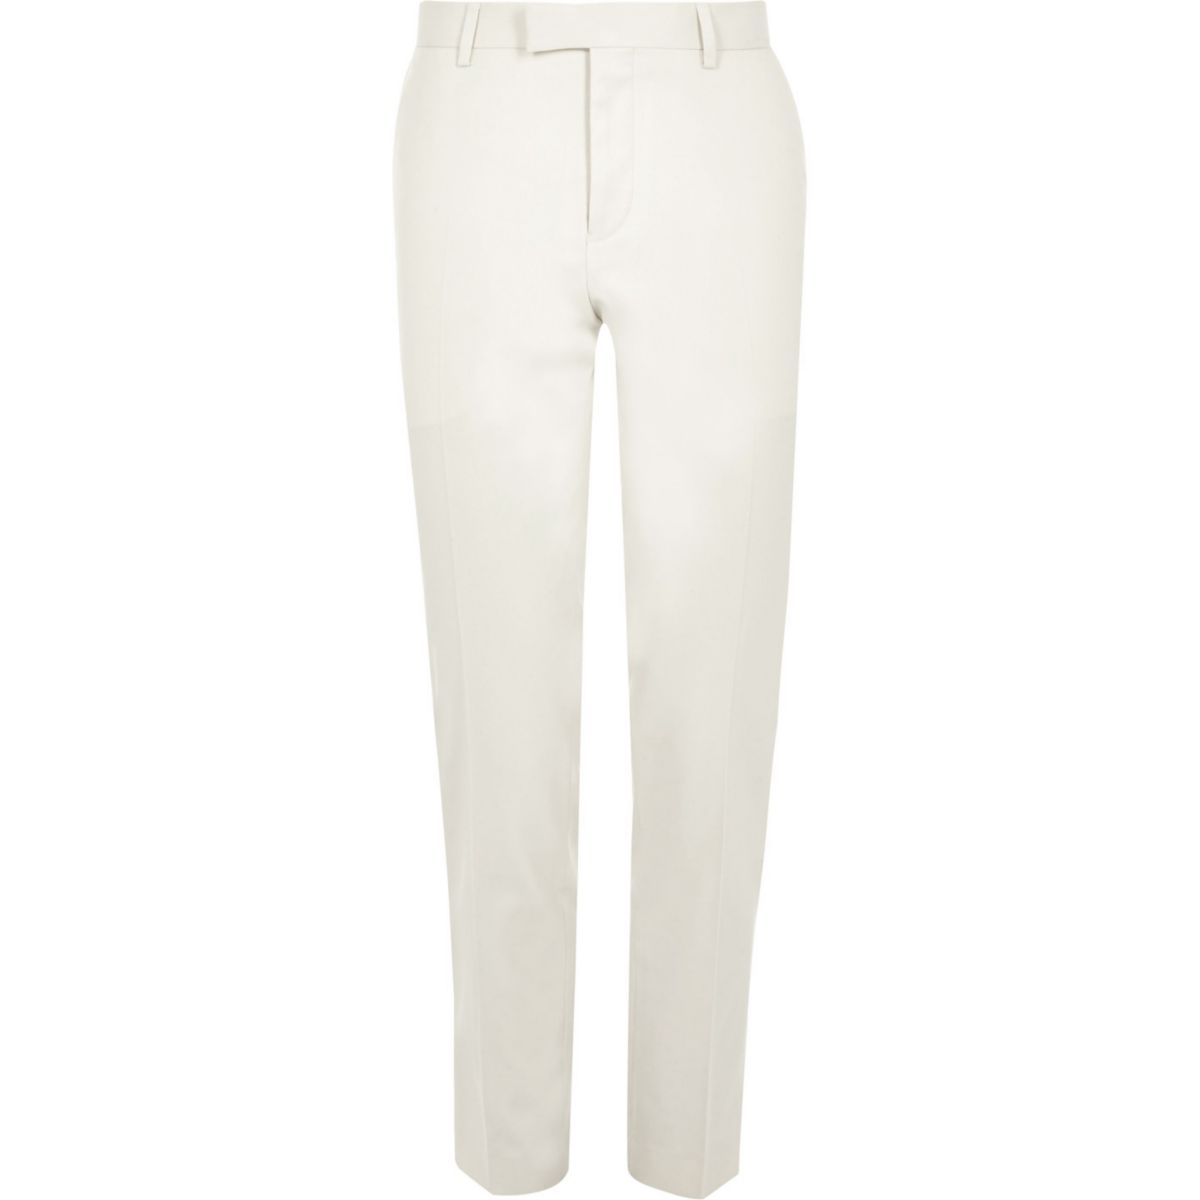 Cream skinny fit suit pants